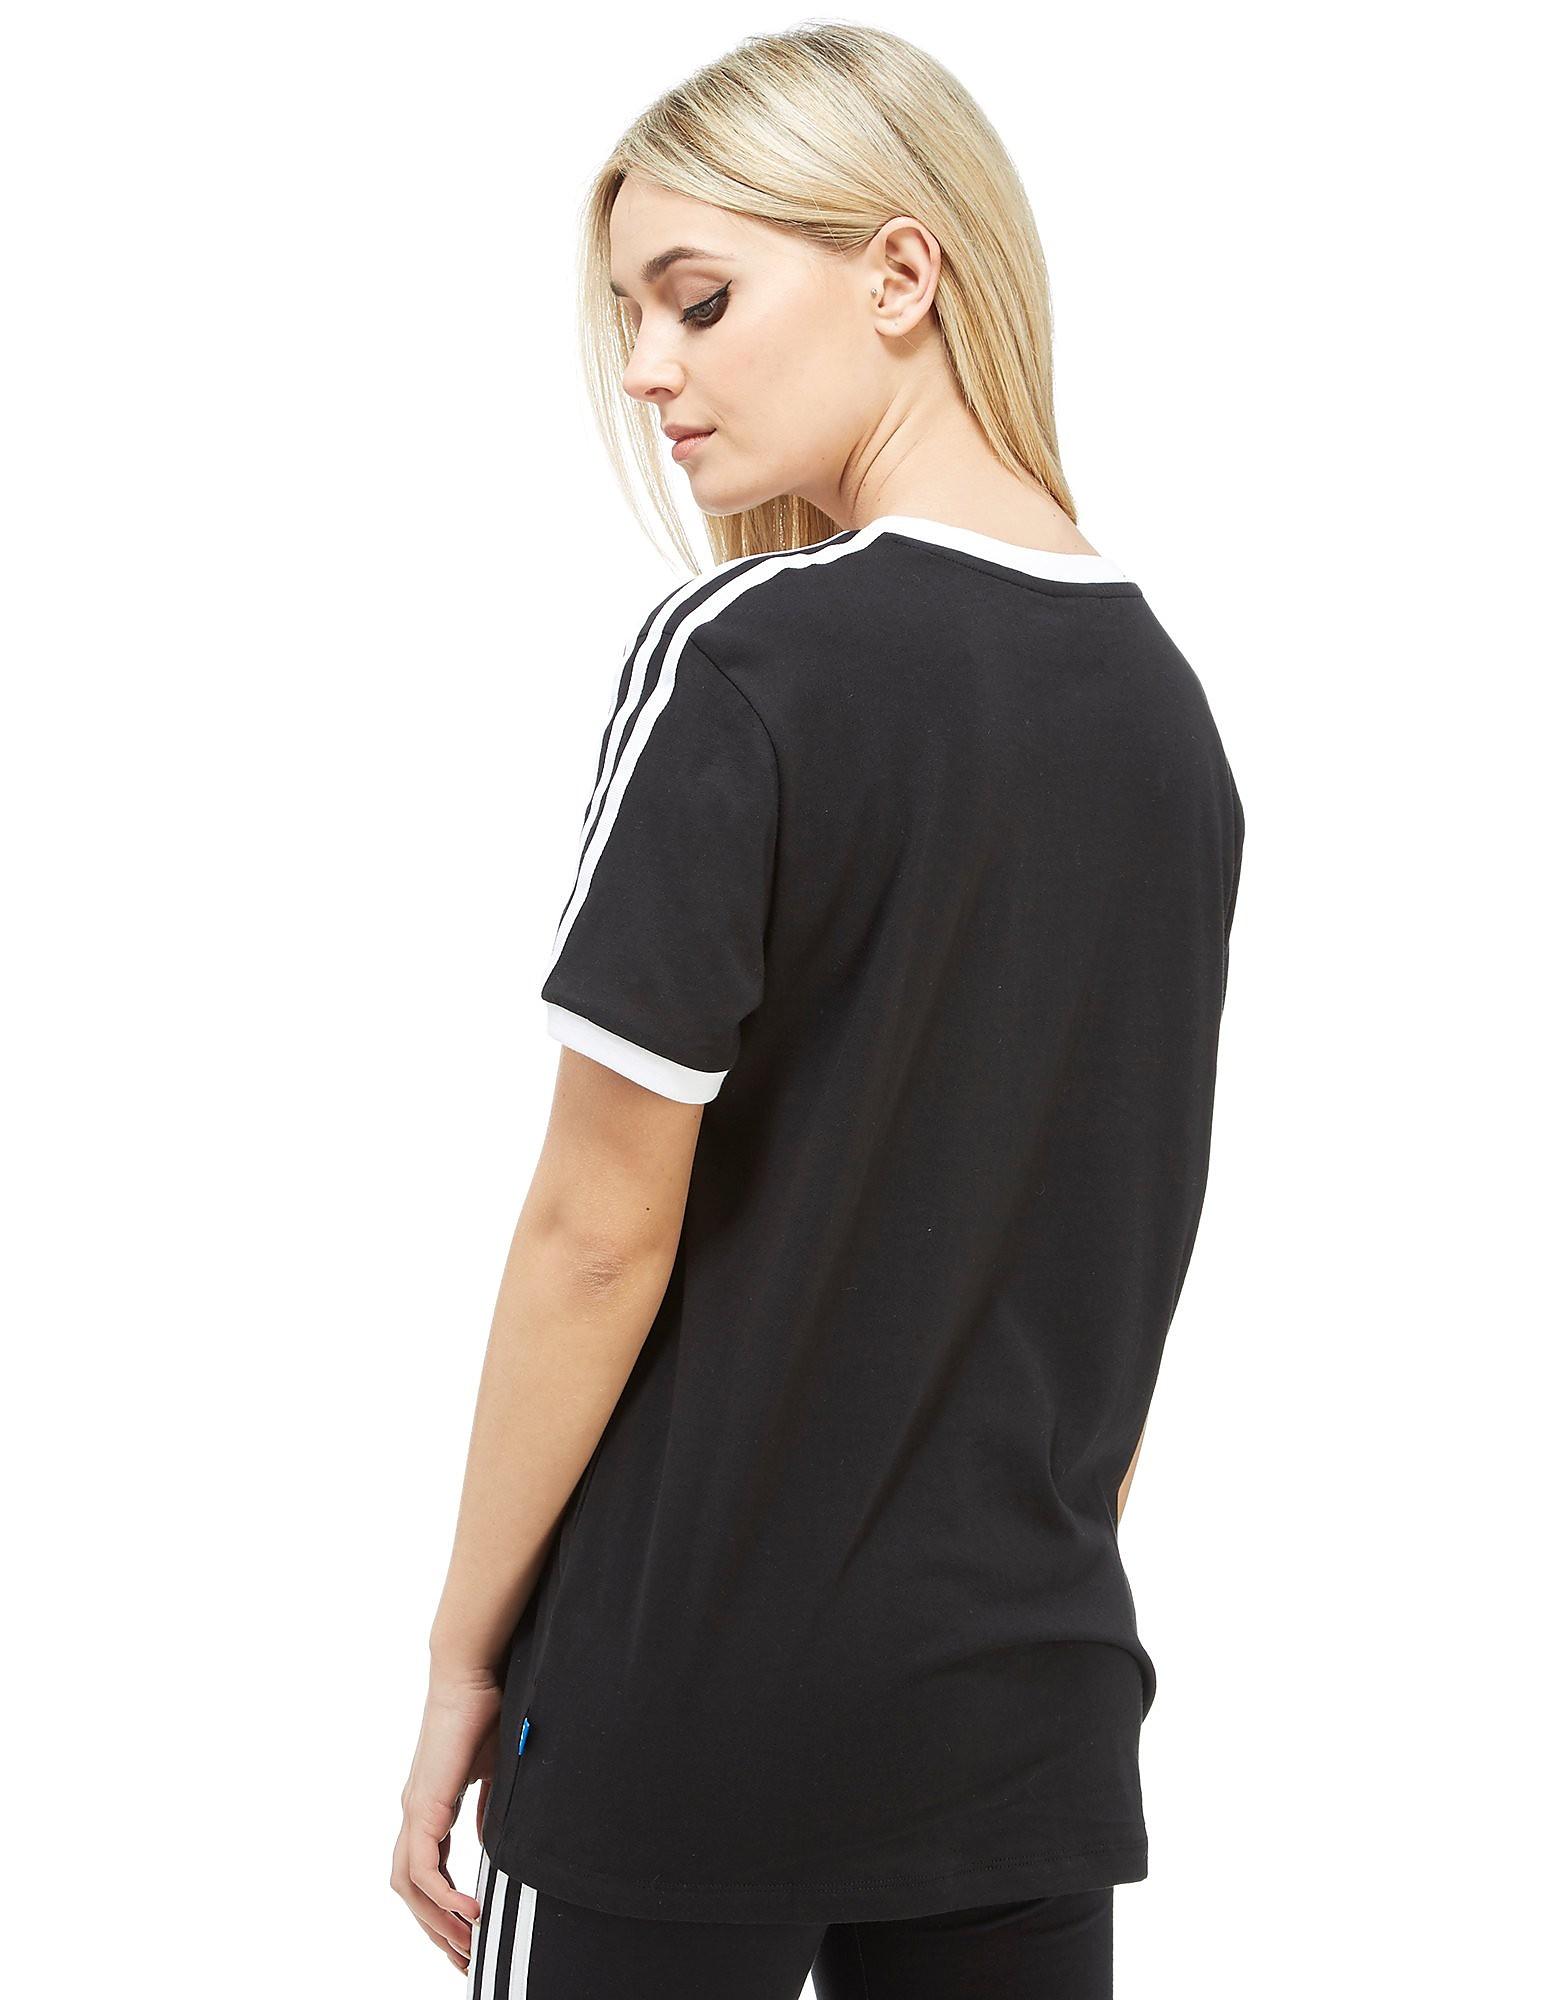 adidas Originals California T-Shirt Women's